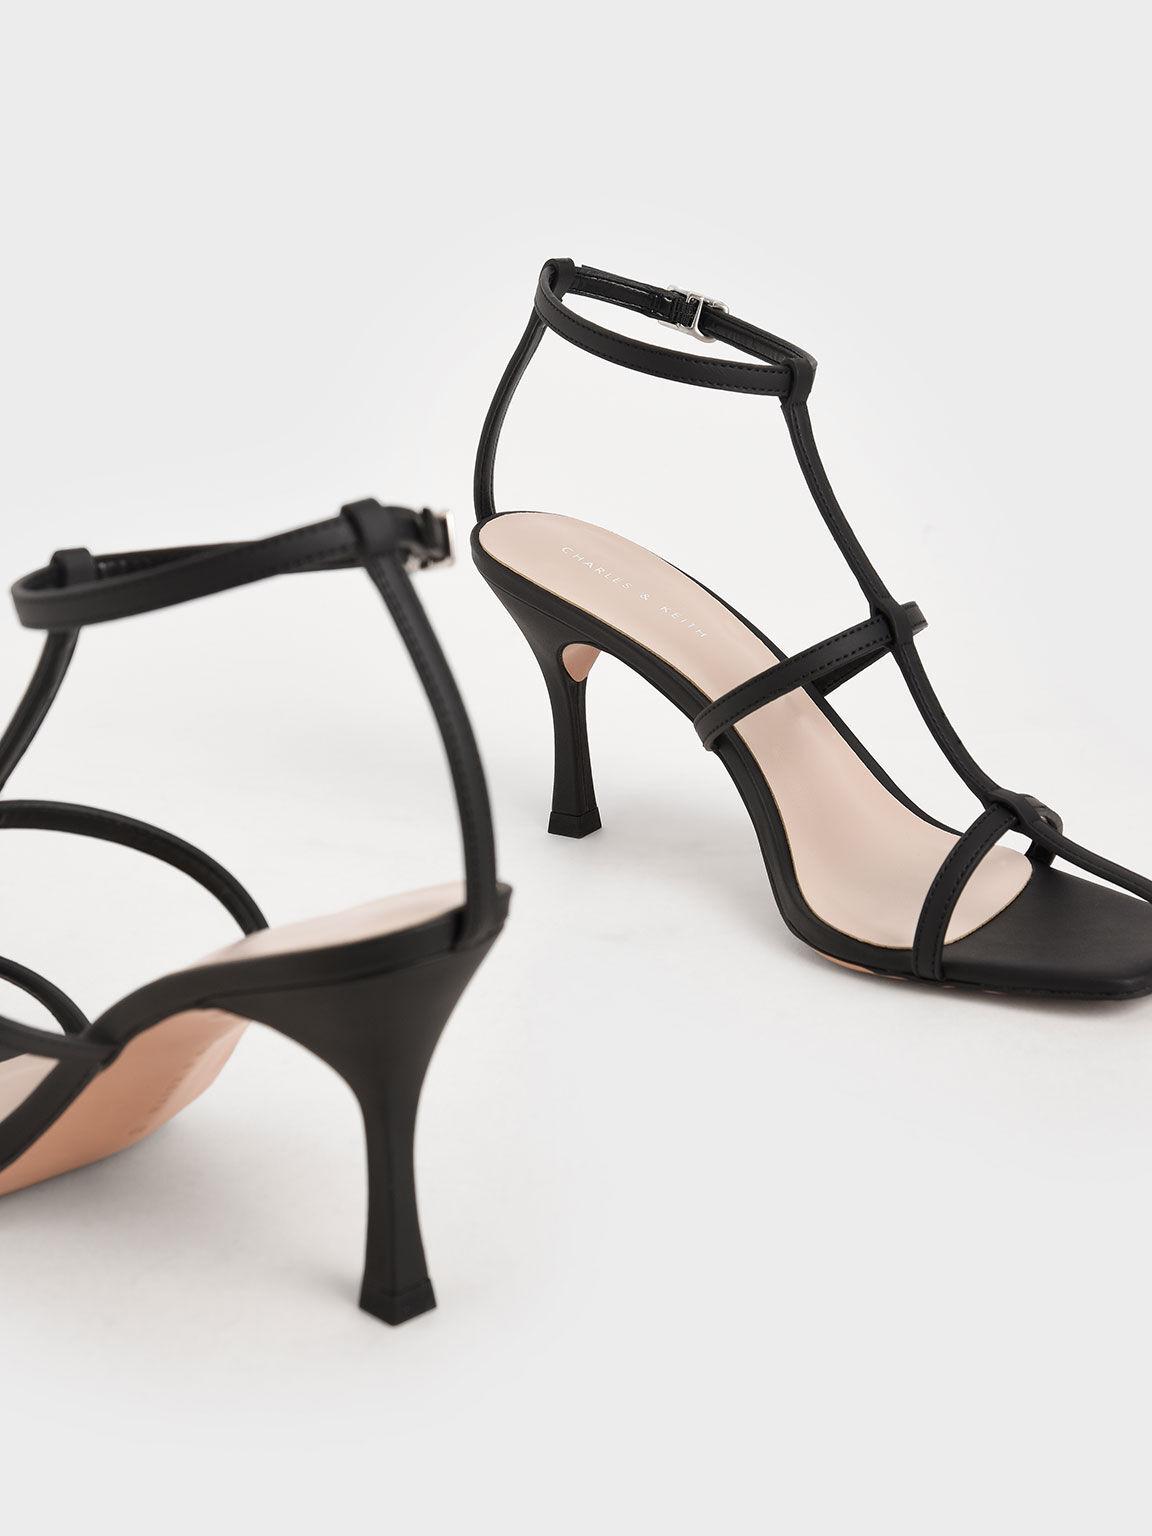 Caged Strappy Heeled Sandals, Black, hi-res